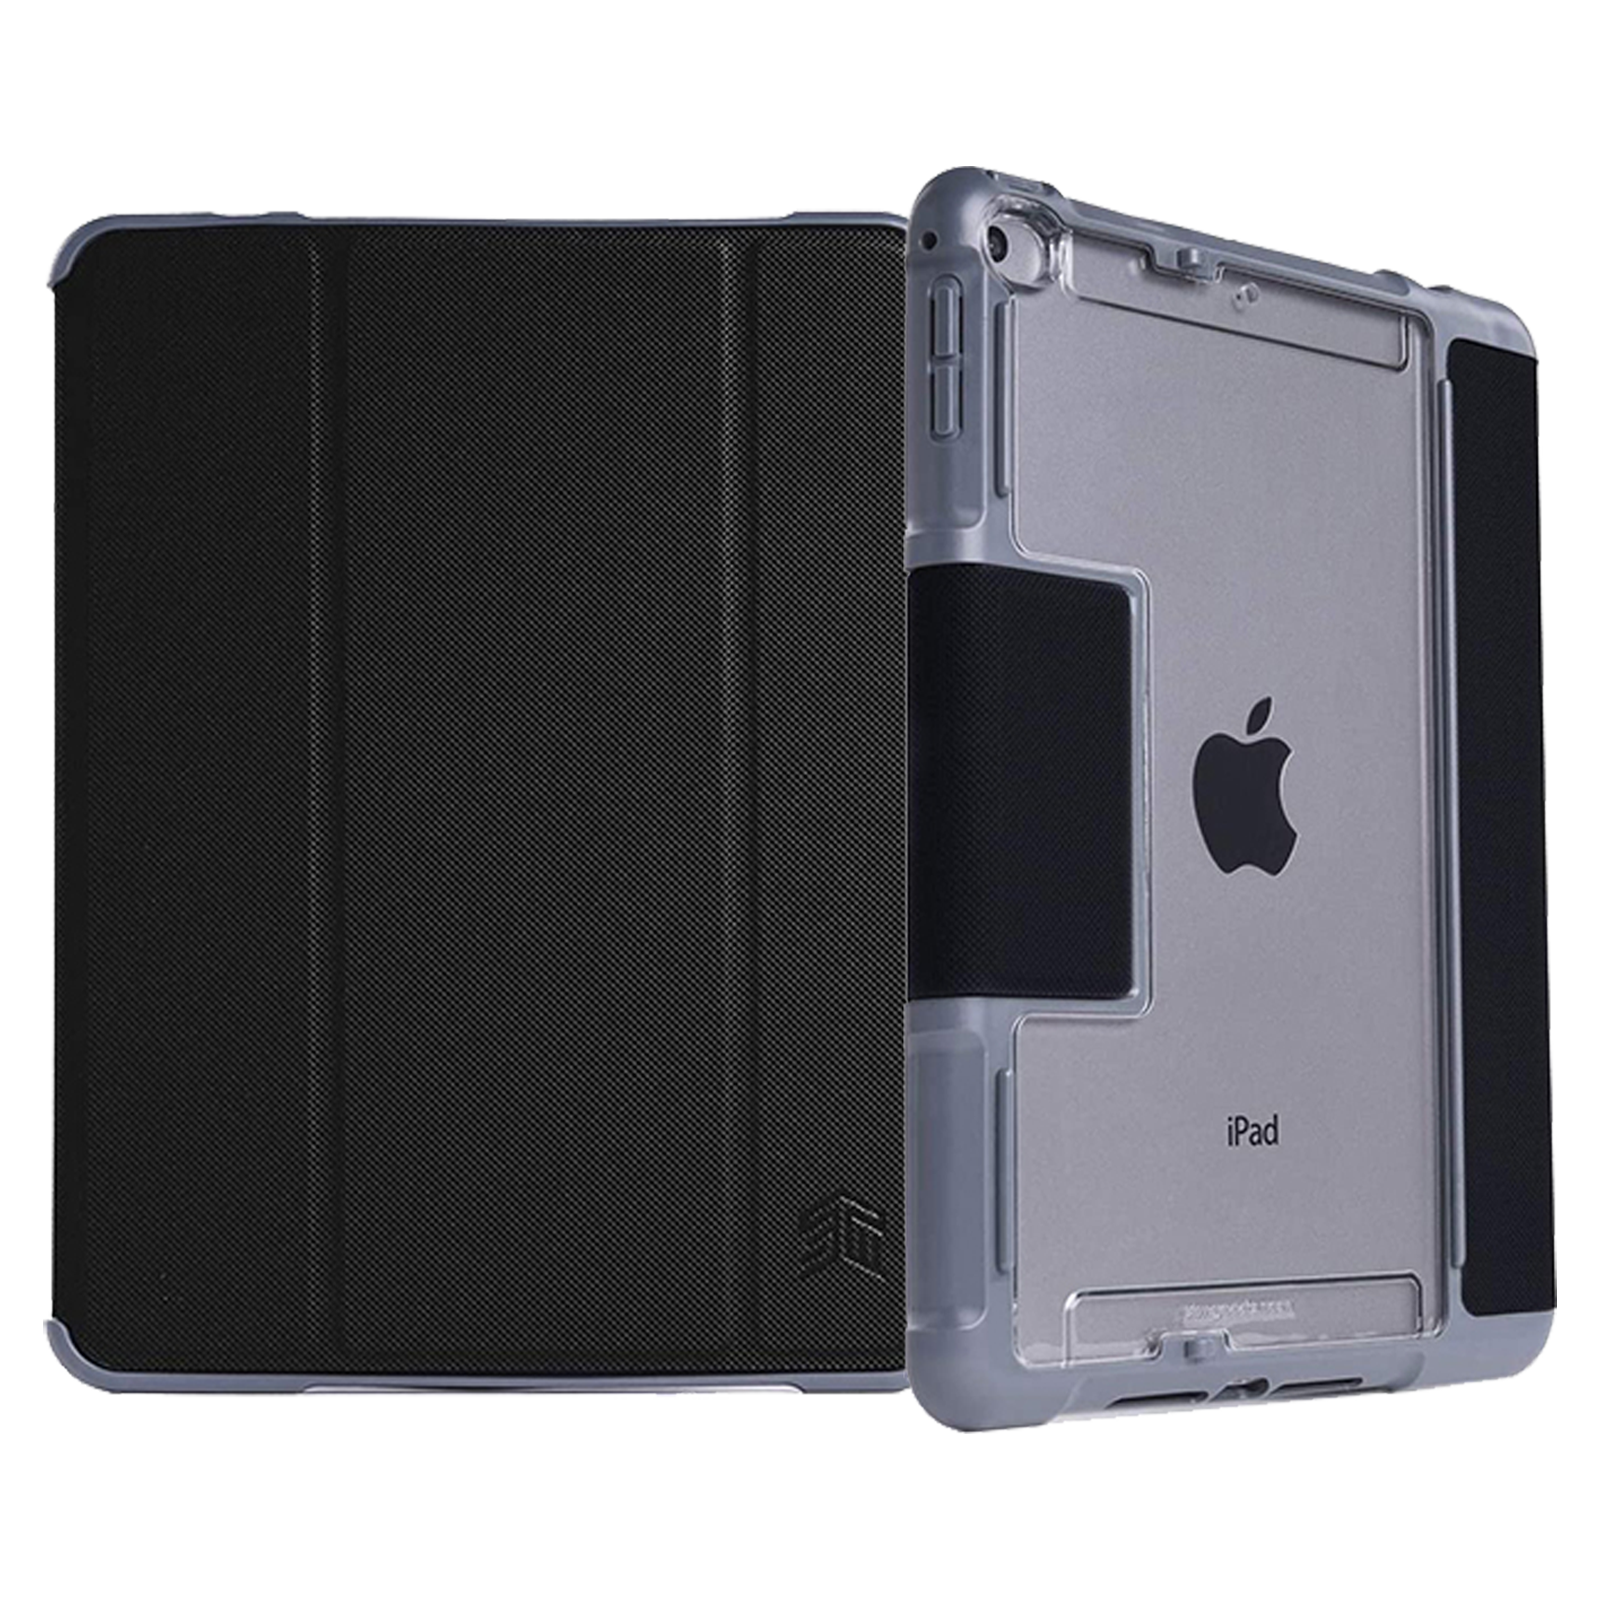 STM Dux Plus Duo Polyurethane Flip Case For iPad Mini 4/5th Gen (Instant On/Off Cover, STM-222-236GY-01, Black)_1